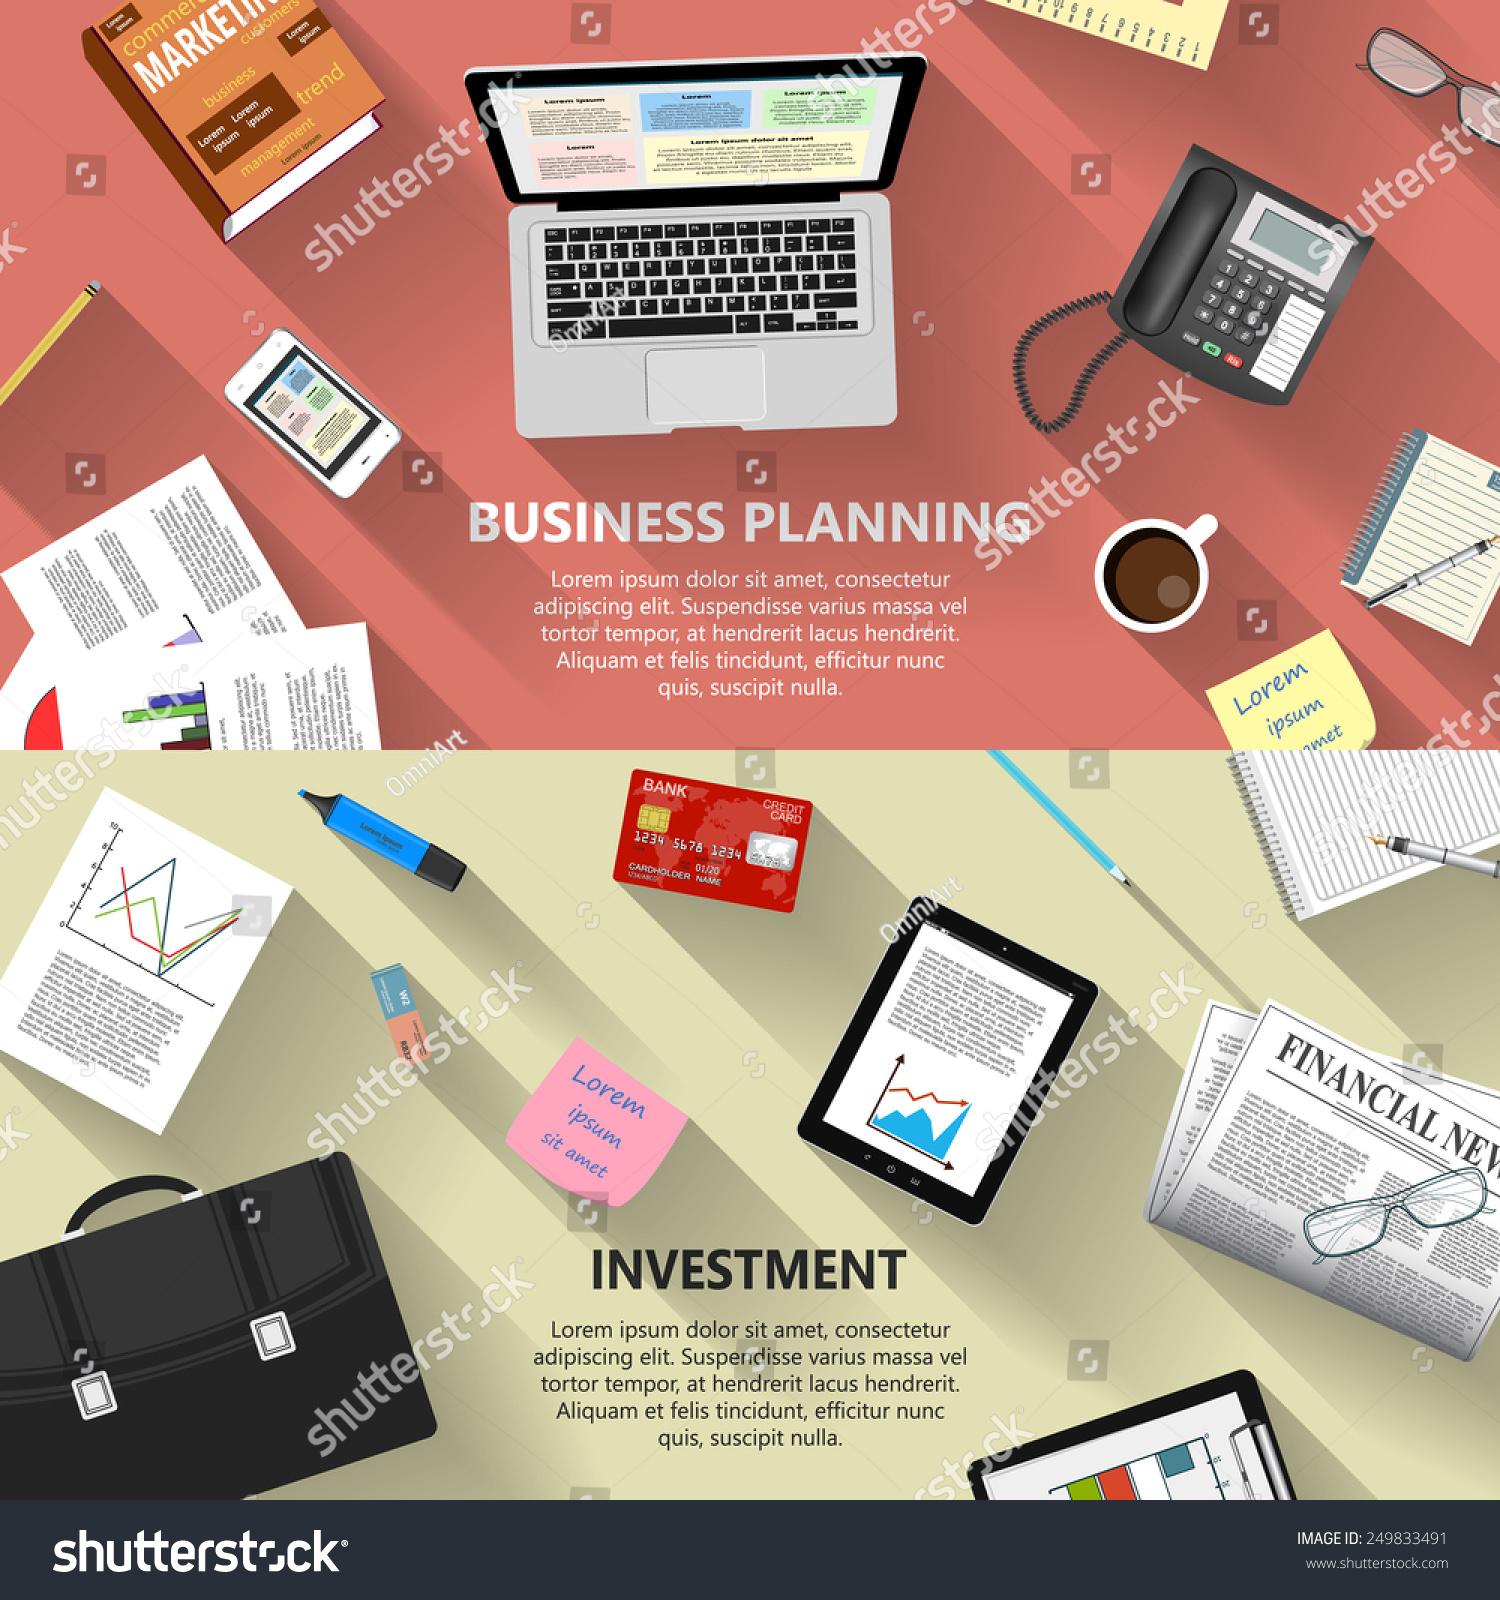 business plan muziek beluisteren